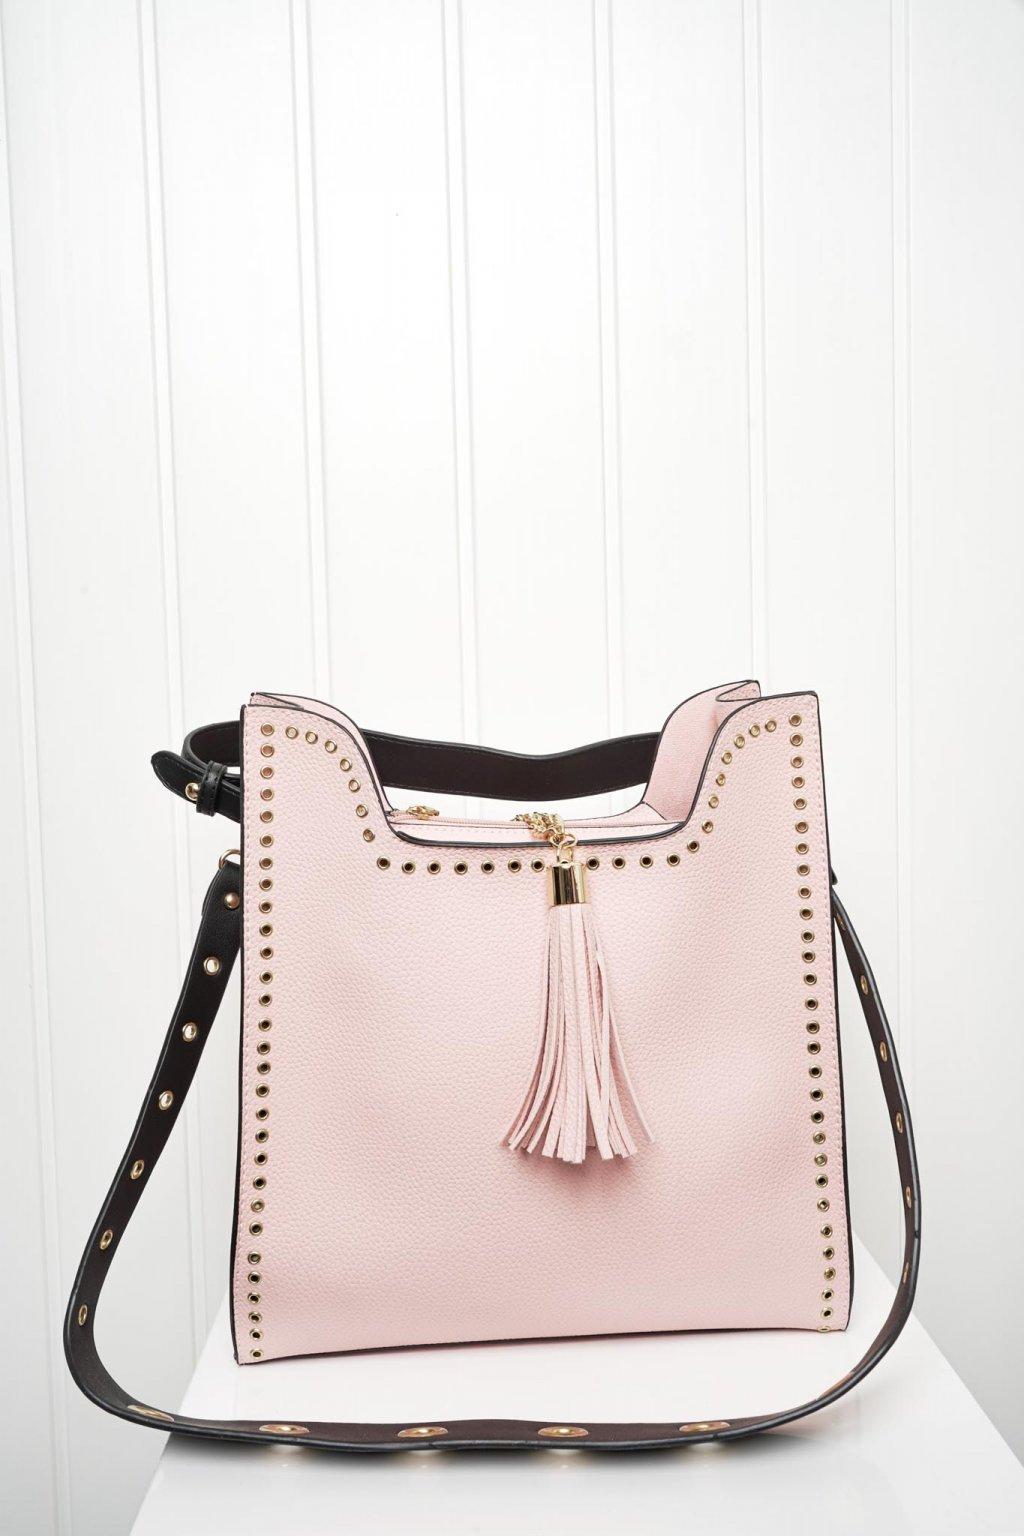 Kabelka, crossbody, ruksak, shopping bag, shopperka, 011